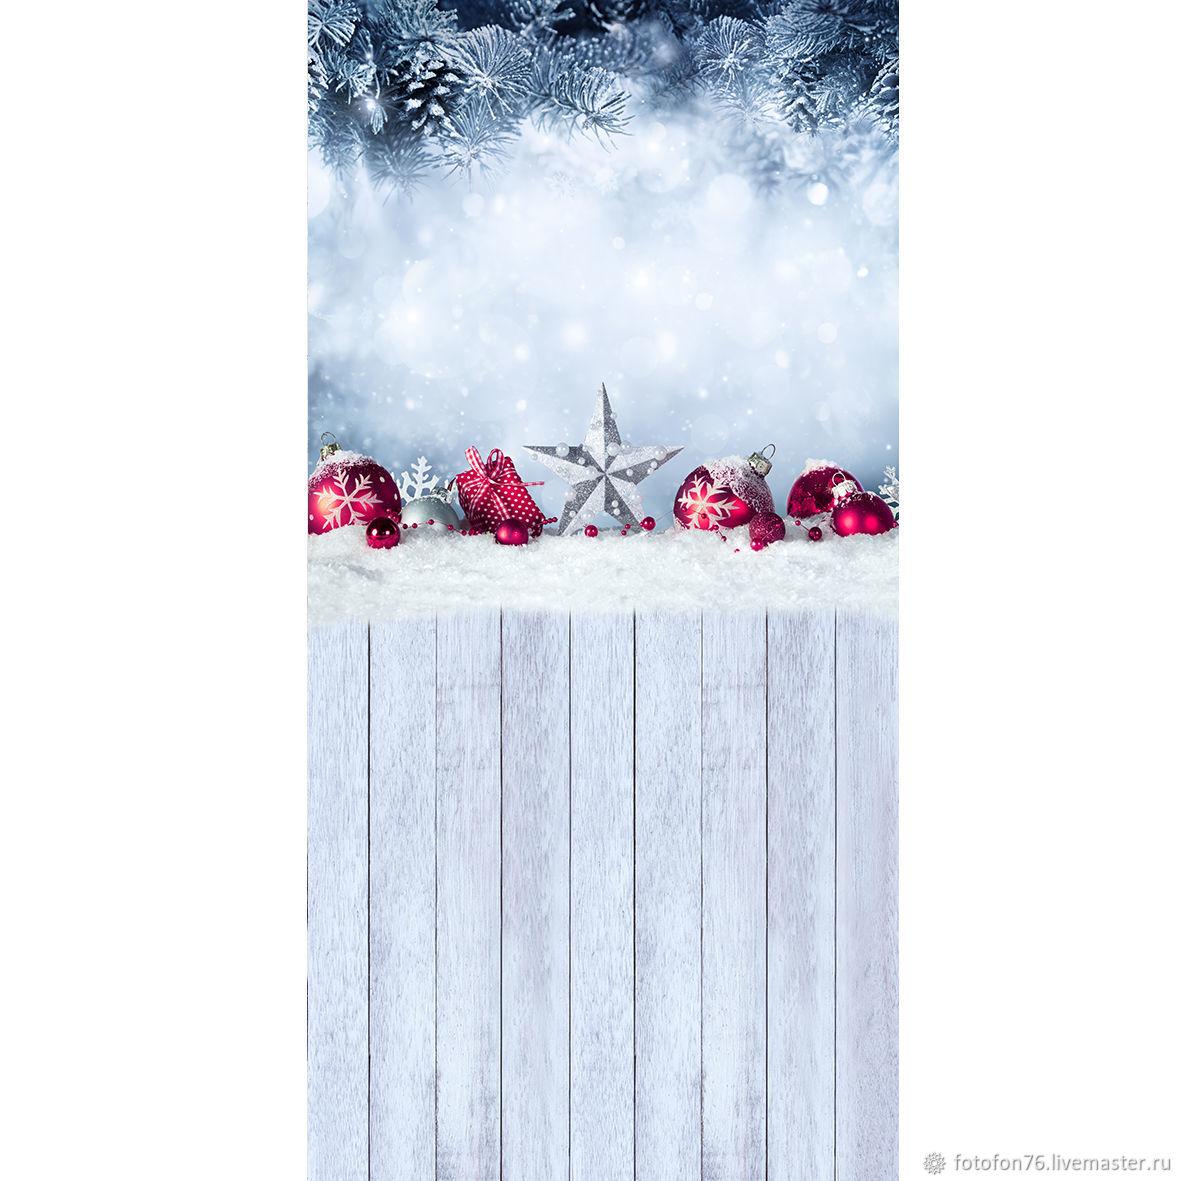 Фотофон Новогодние игрушки (пол/стена) 50х100 см, Фото, Ярославль,  Фото №1